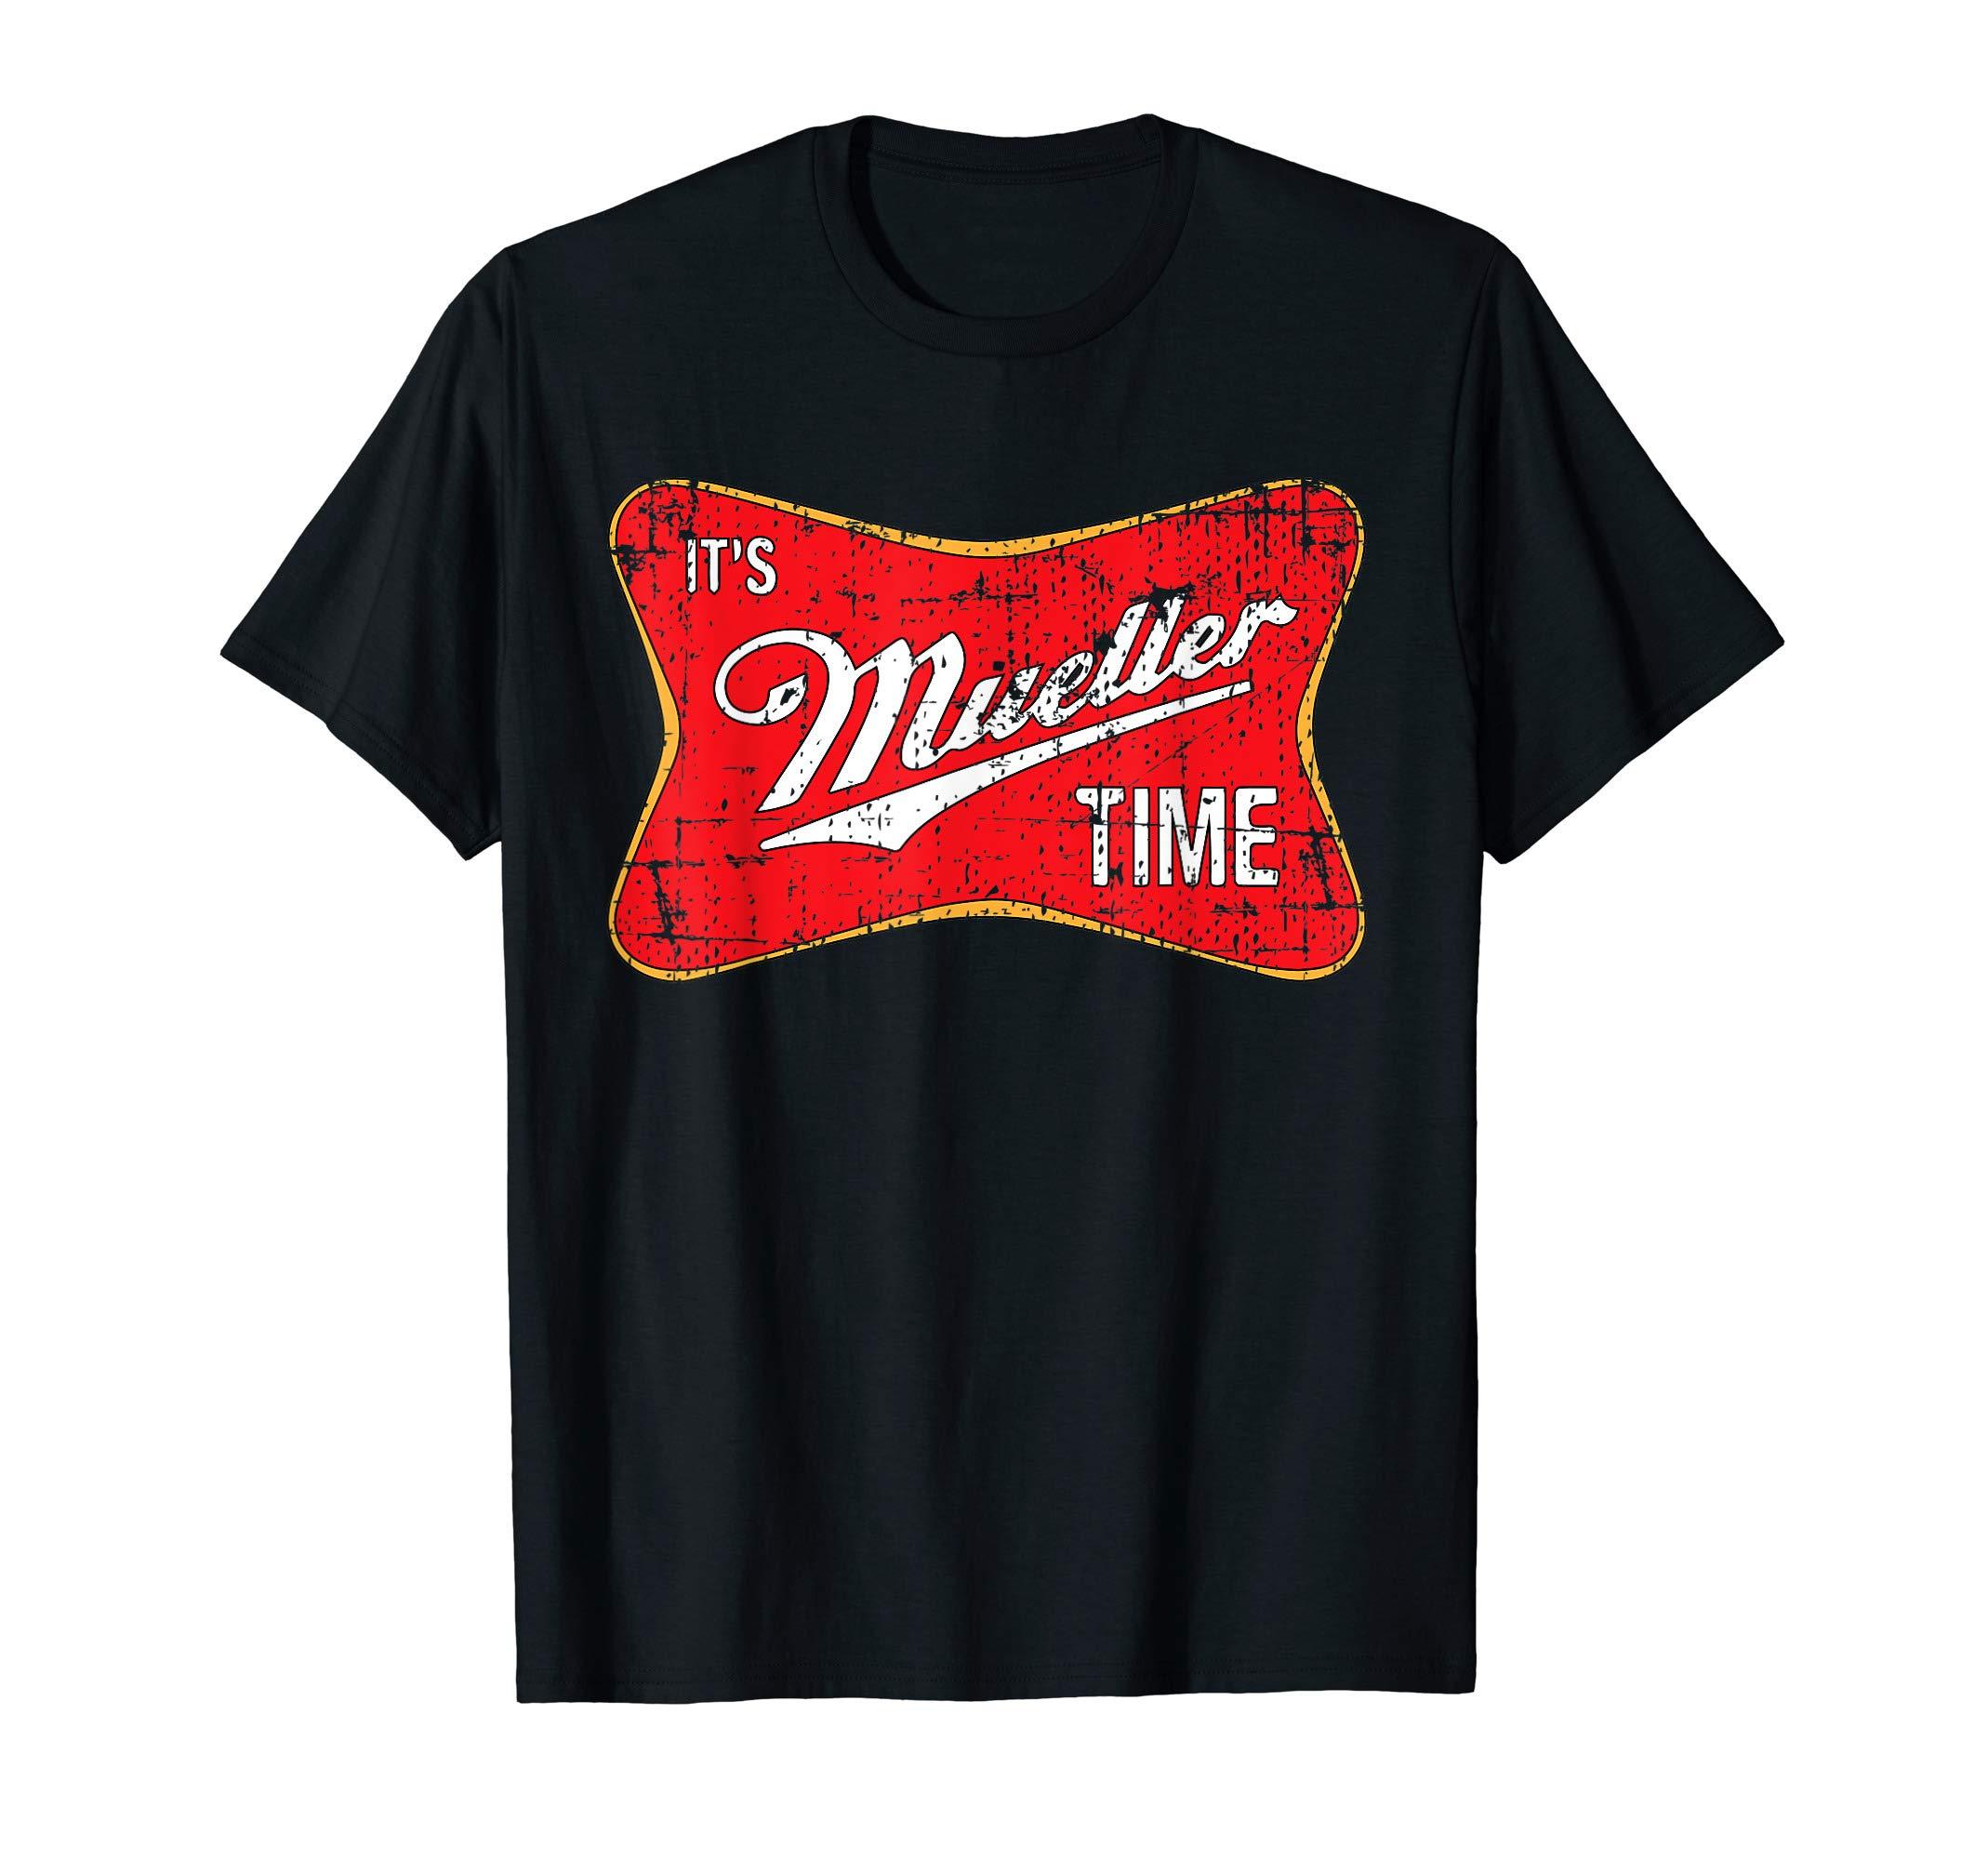 It's Robert Mueller Time Anti Trump 2019 Resist Tee Shirt